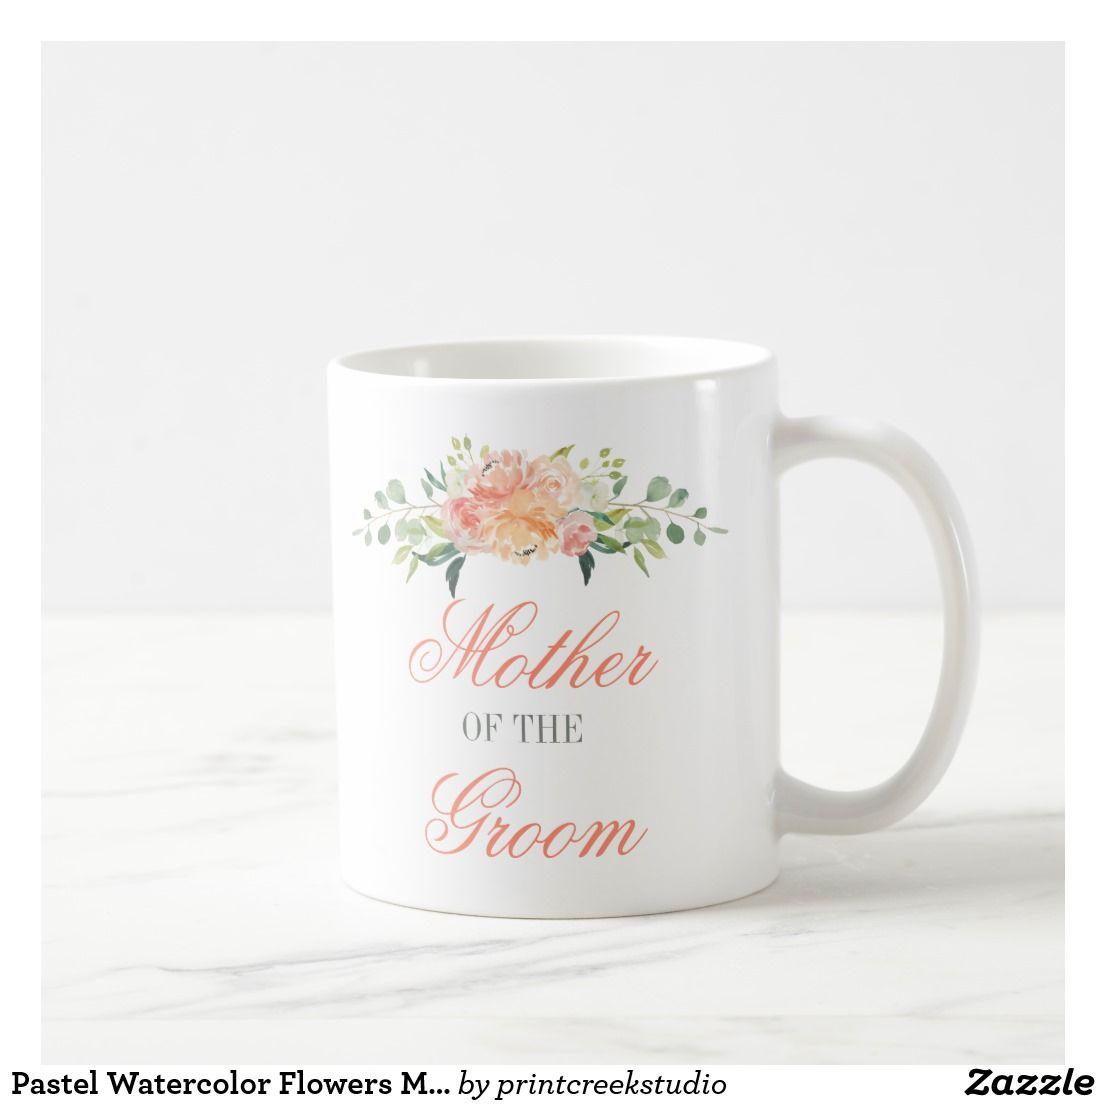 Pastel Watercolor Flowers Mother of the Groom Coffee Mug | Floral ...